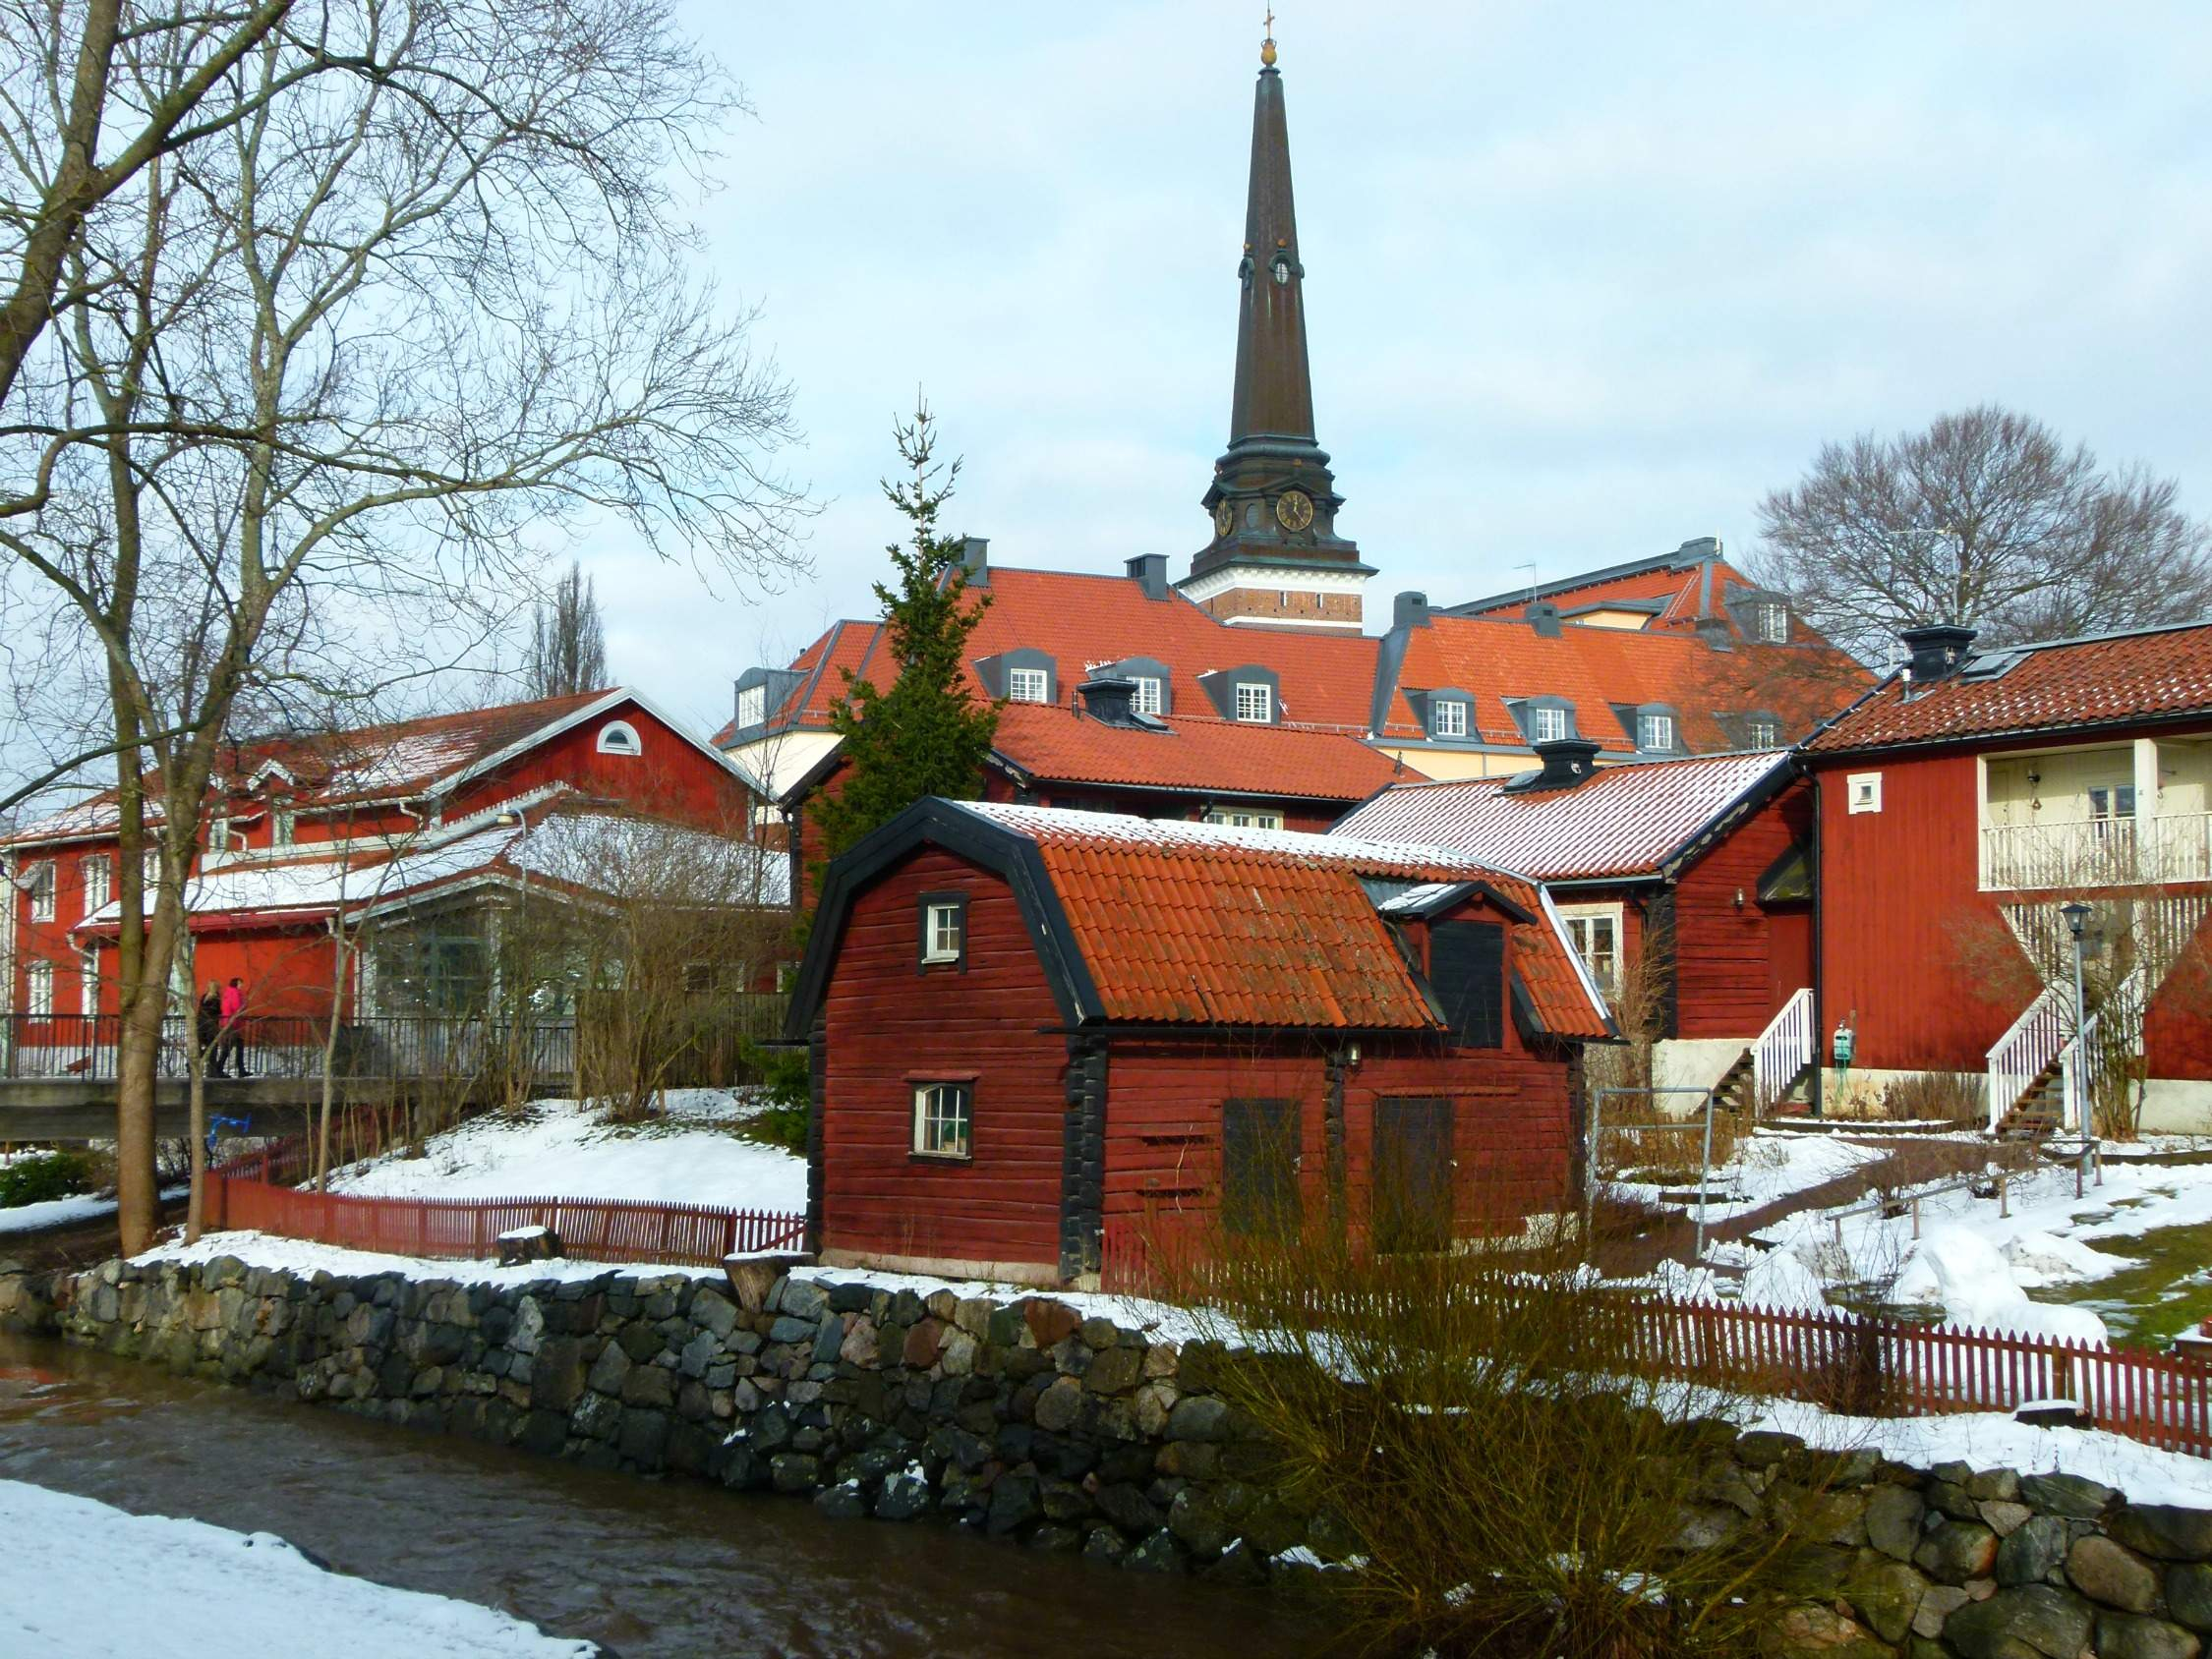 Experiencing Sweden in a Nutshell – A Visit to Västerås